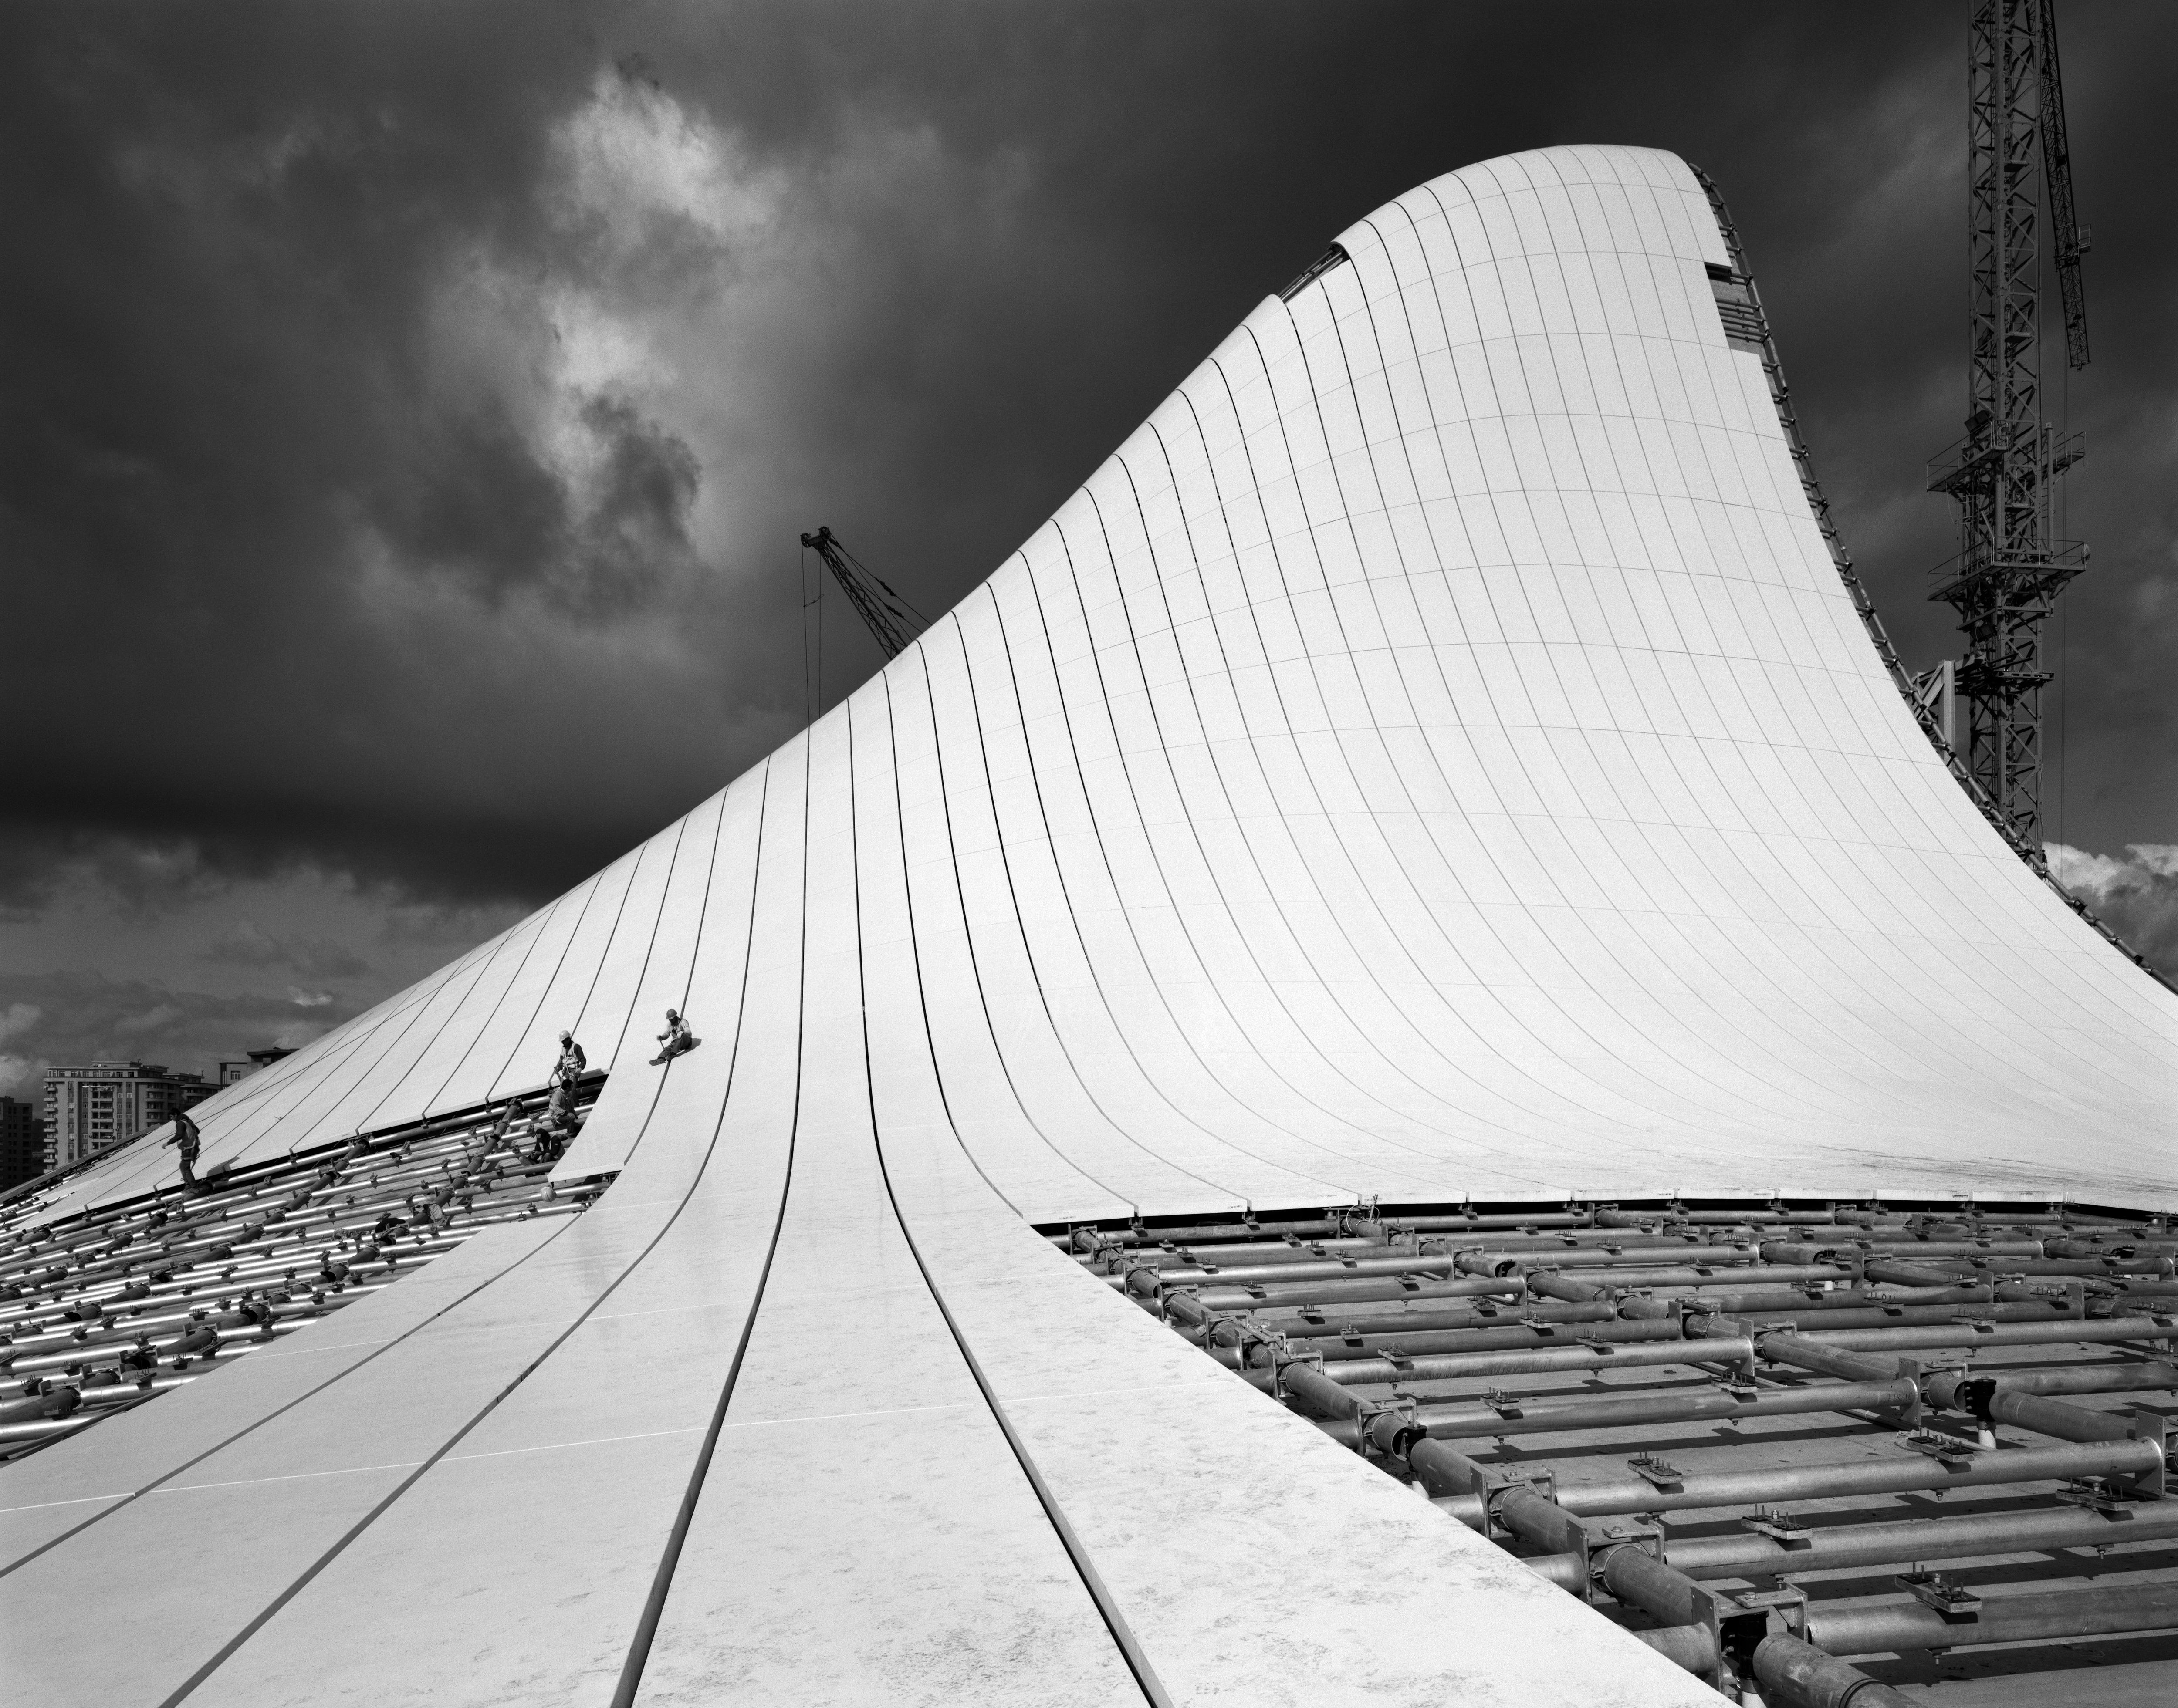 <p>Zaha Hadid Heydar Aliyev Centre. Constructielocatie Baku, Azerbaijan. Courtesy of Ammann Gallery. Beeld: Hélène Binet</p>